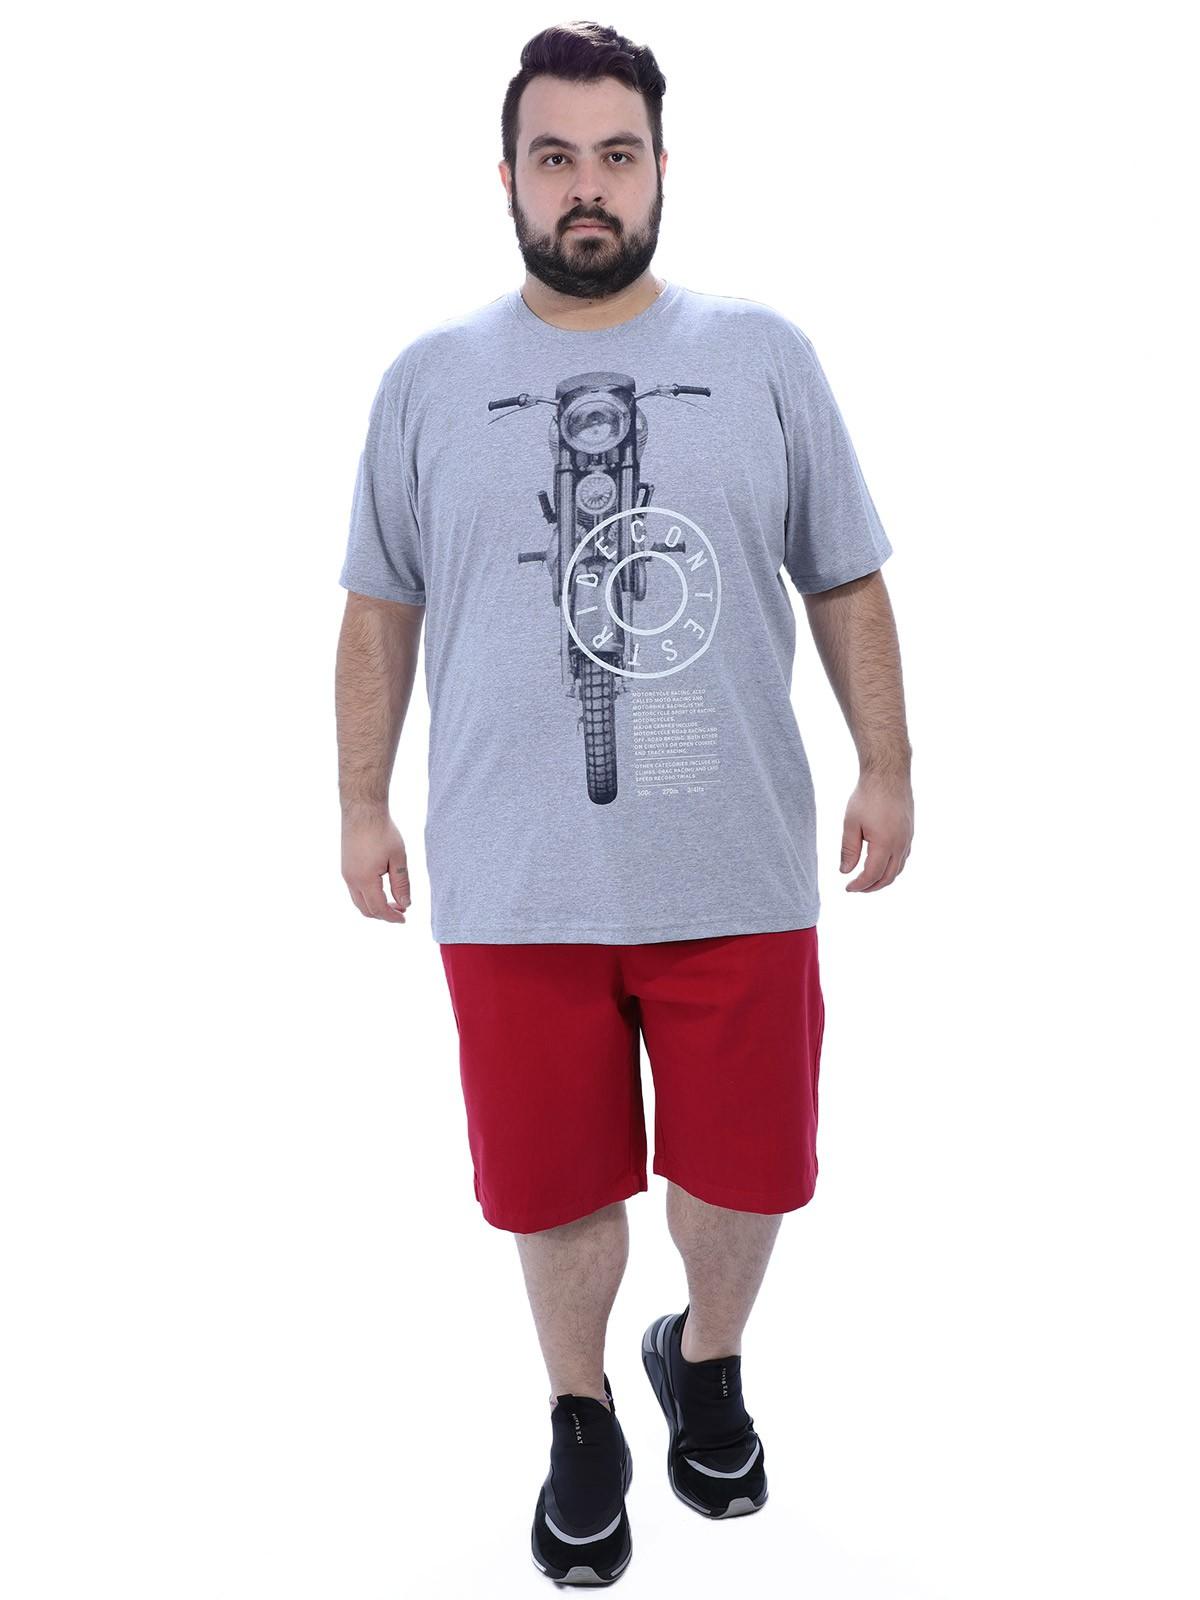 Camiseta Plus Size Masculino Moto Anistia Mescla